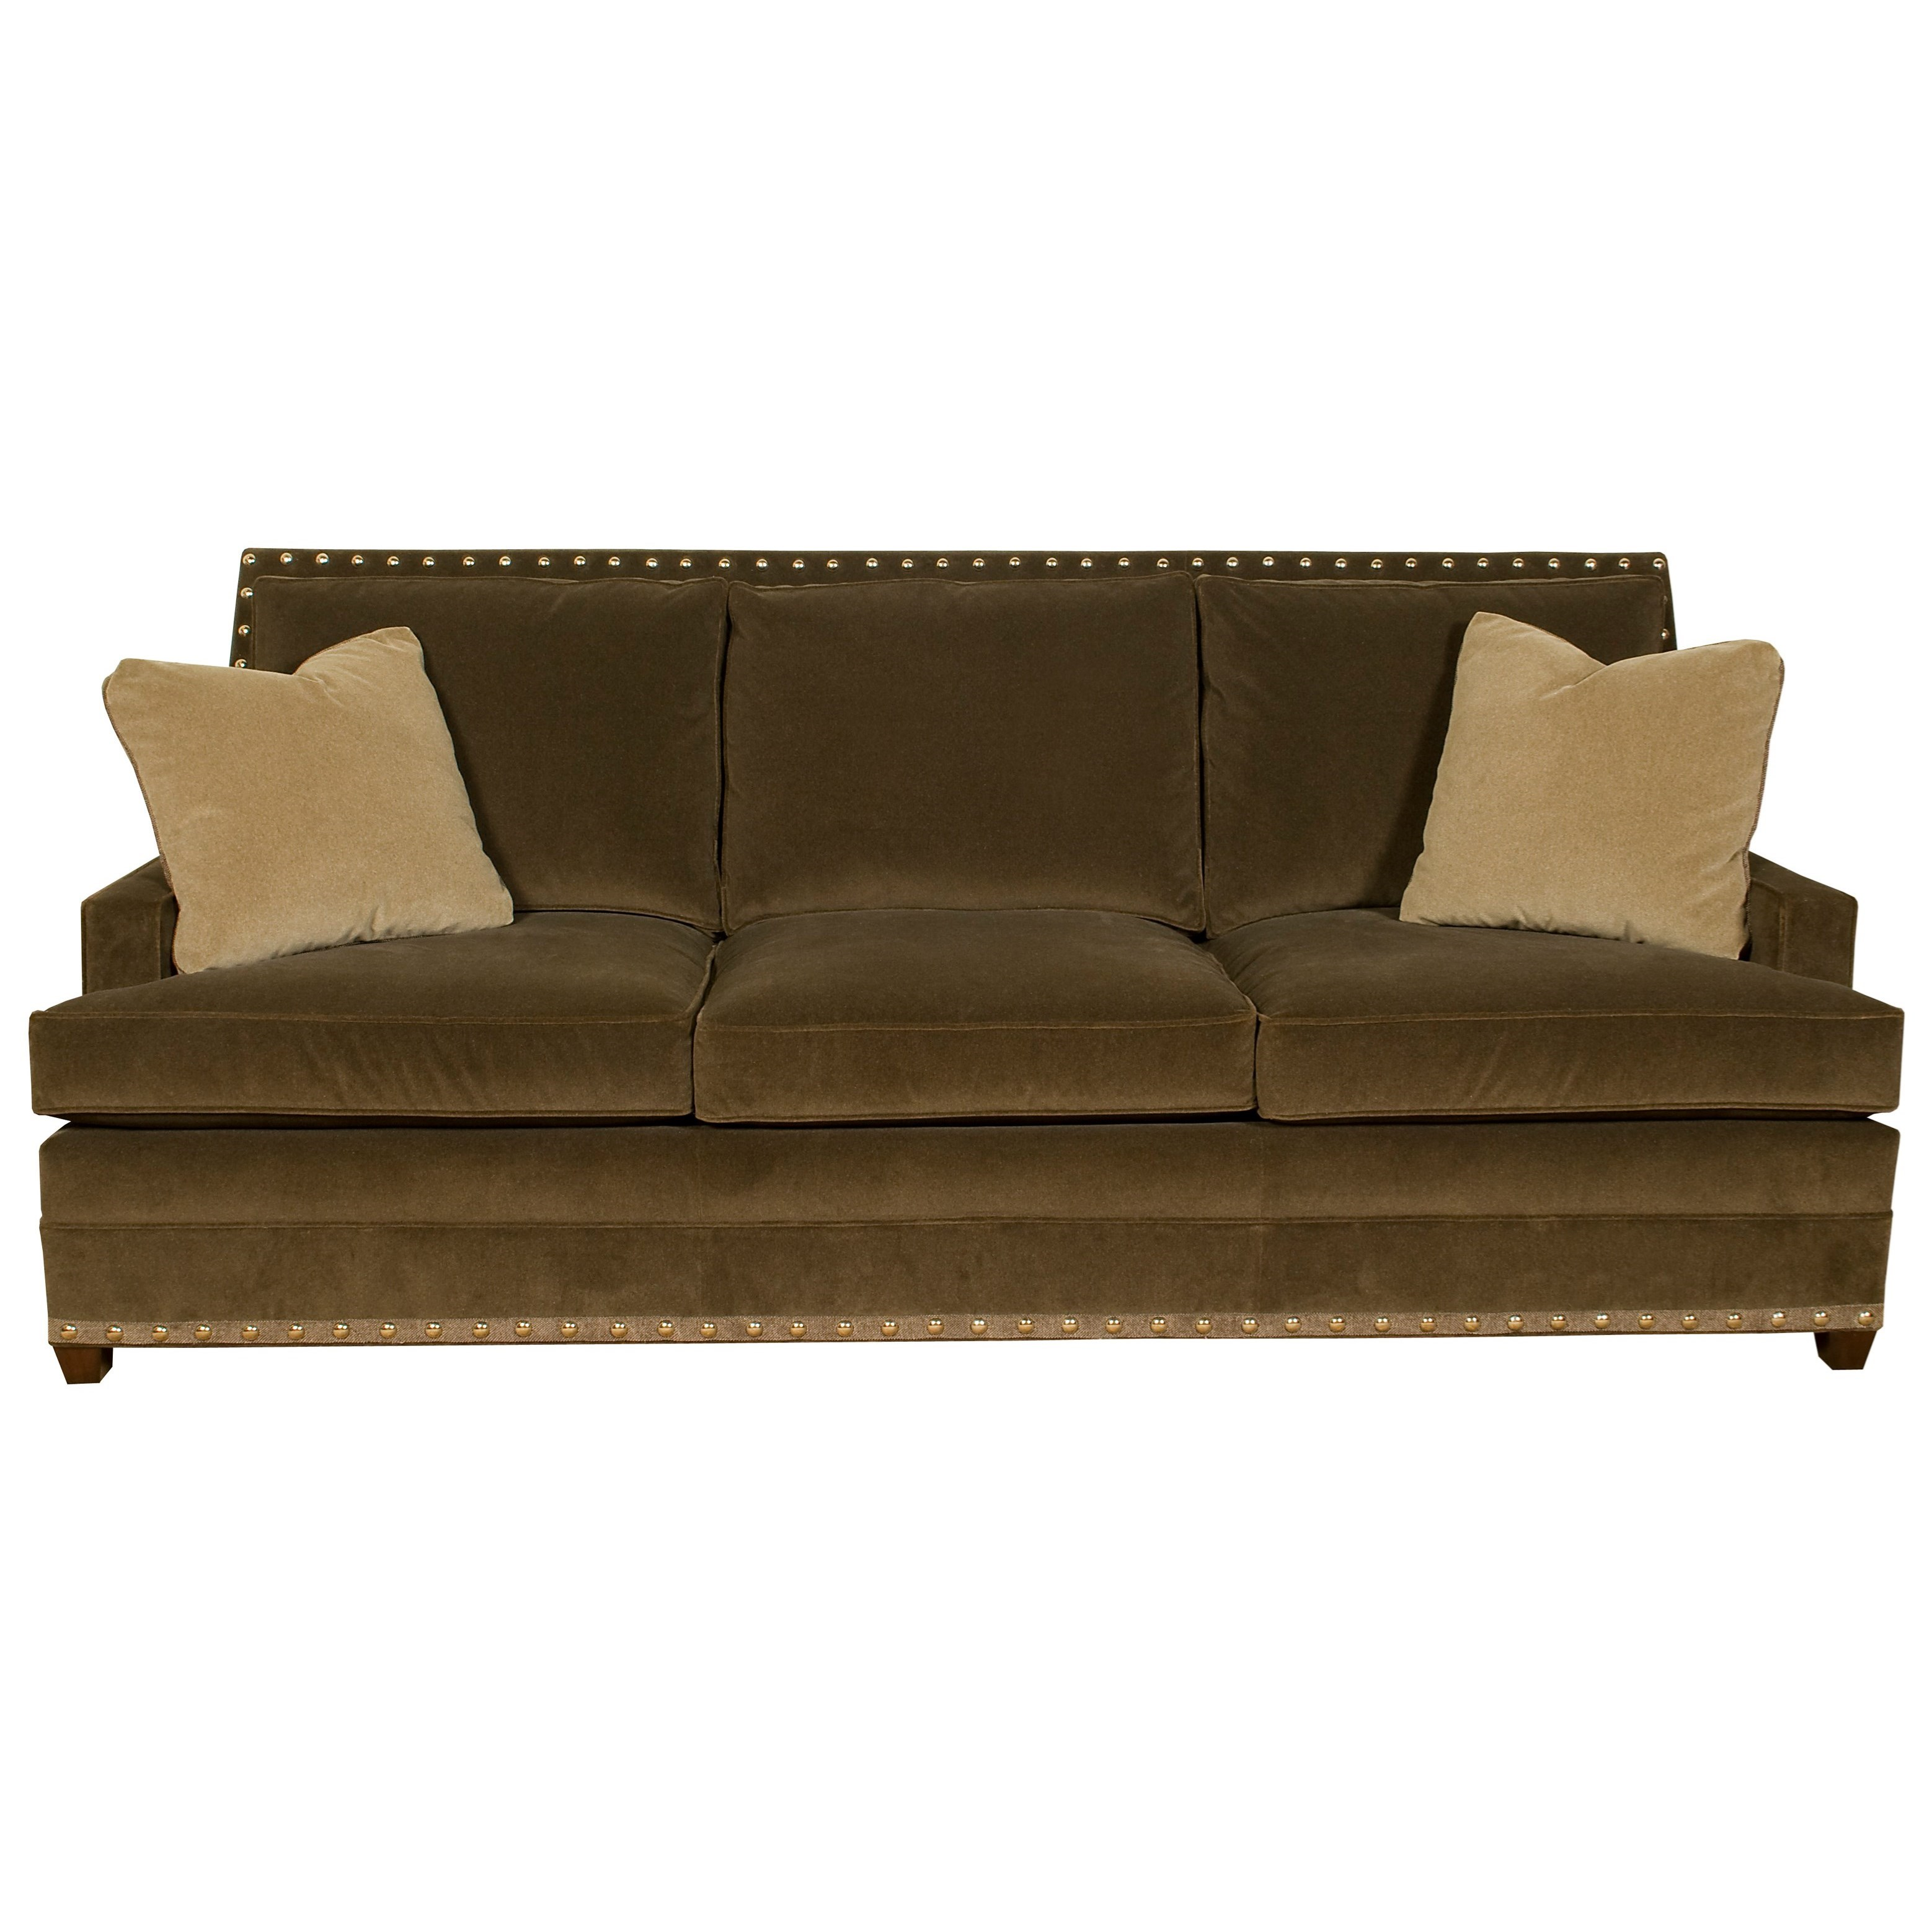 American Bungalow Riverside 3 Seat Sofa by Vanguard Furniture at Sprintz Furniture